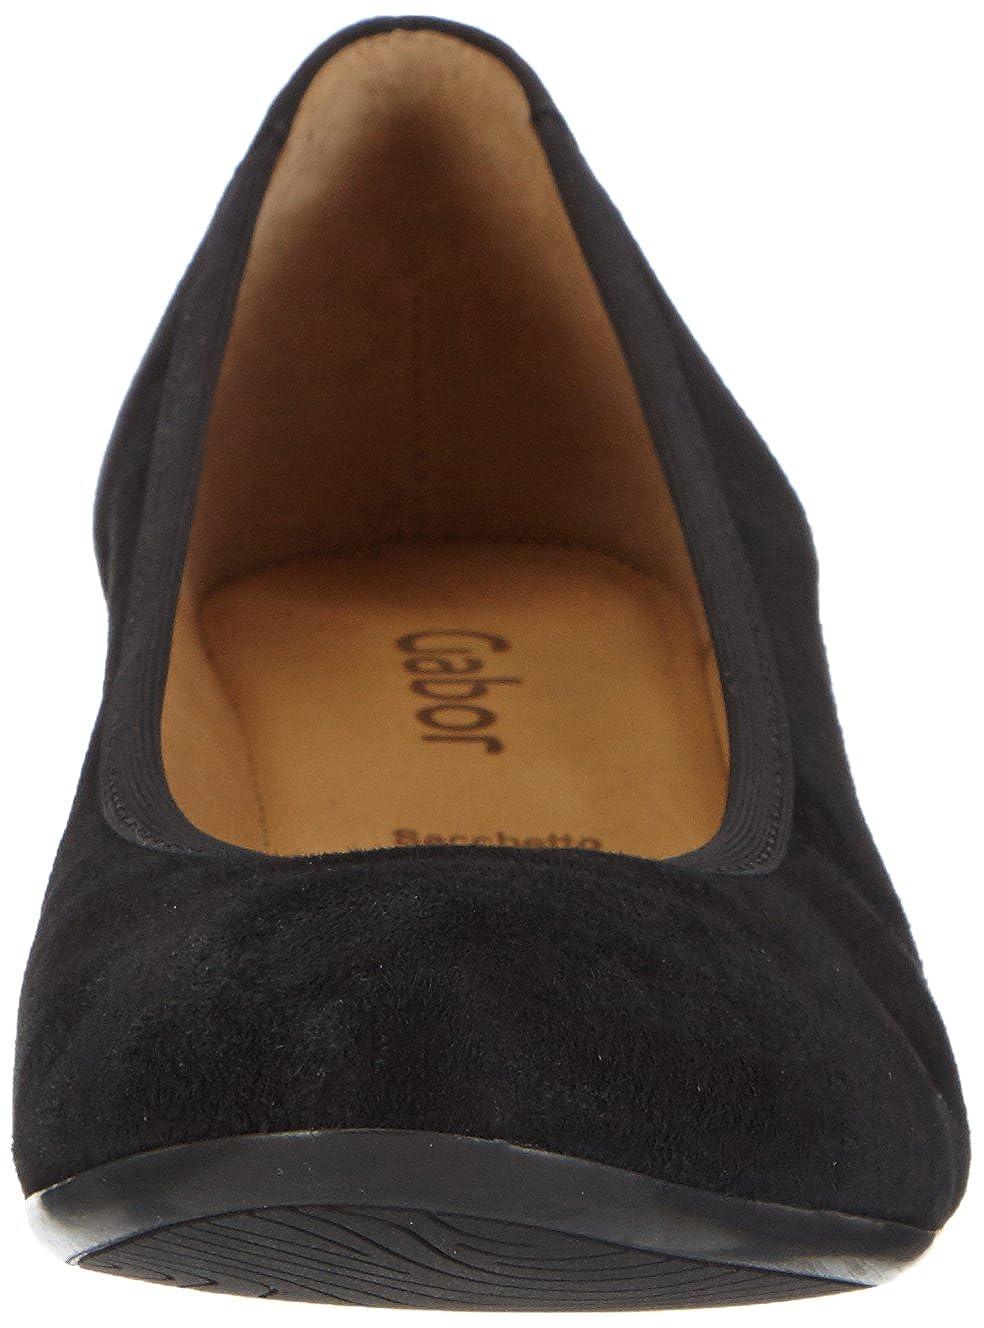 Gabor Schuhes 35.36 Schwarz Damen Geschlossen Pumps Schwarz 35.36 (Schwarz 17) 607d8f